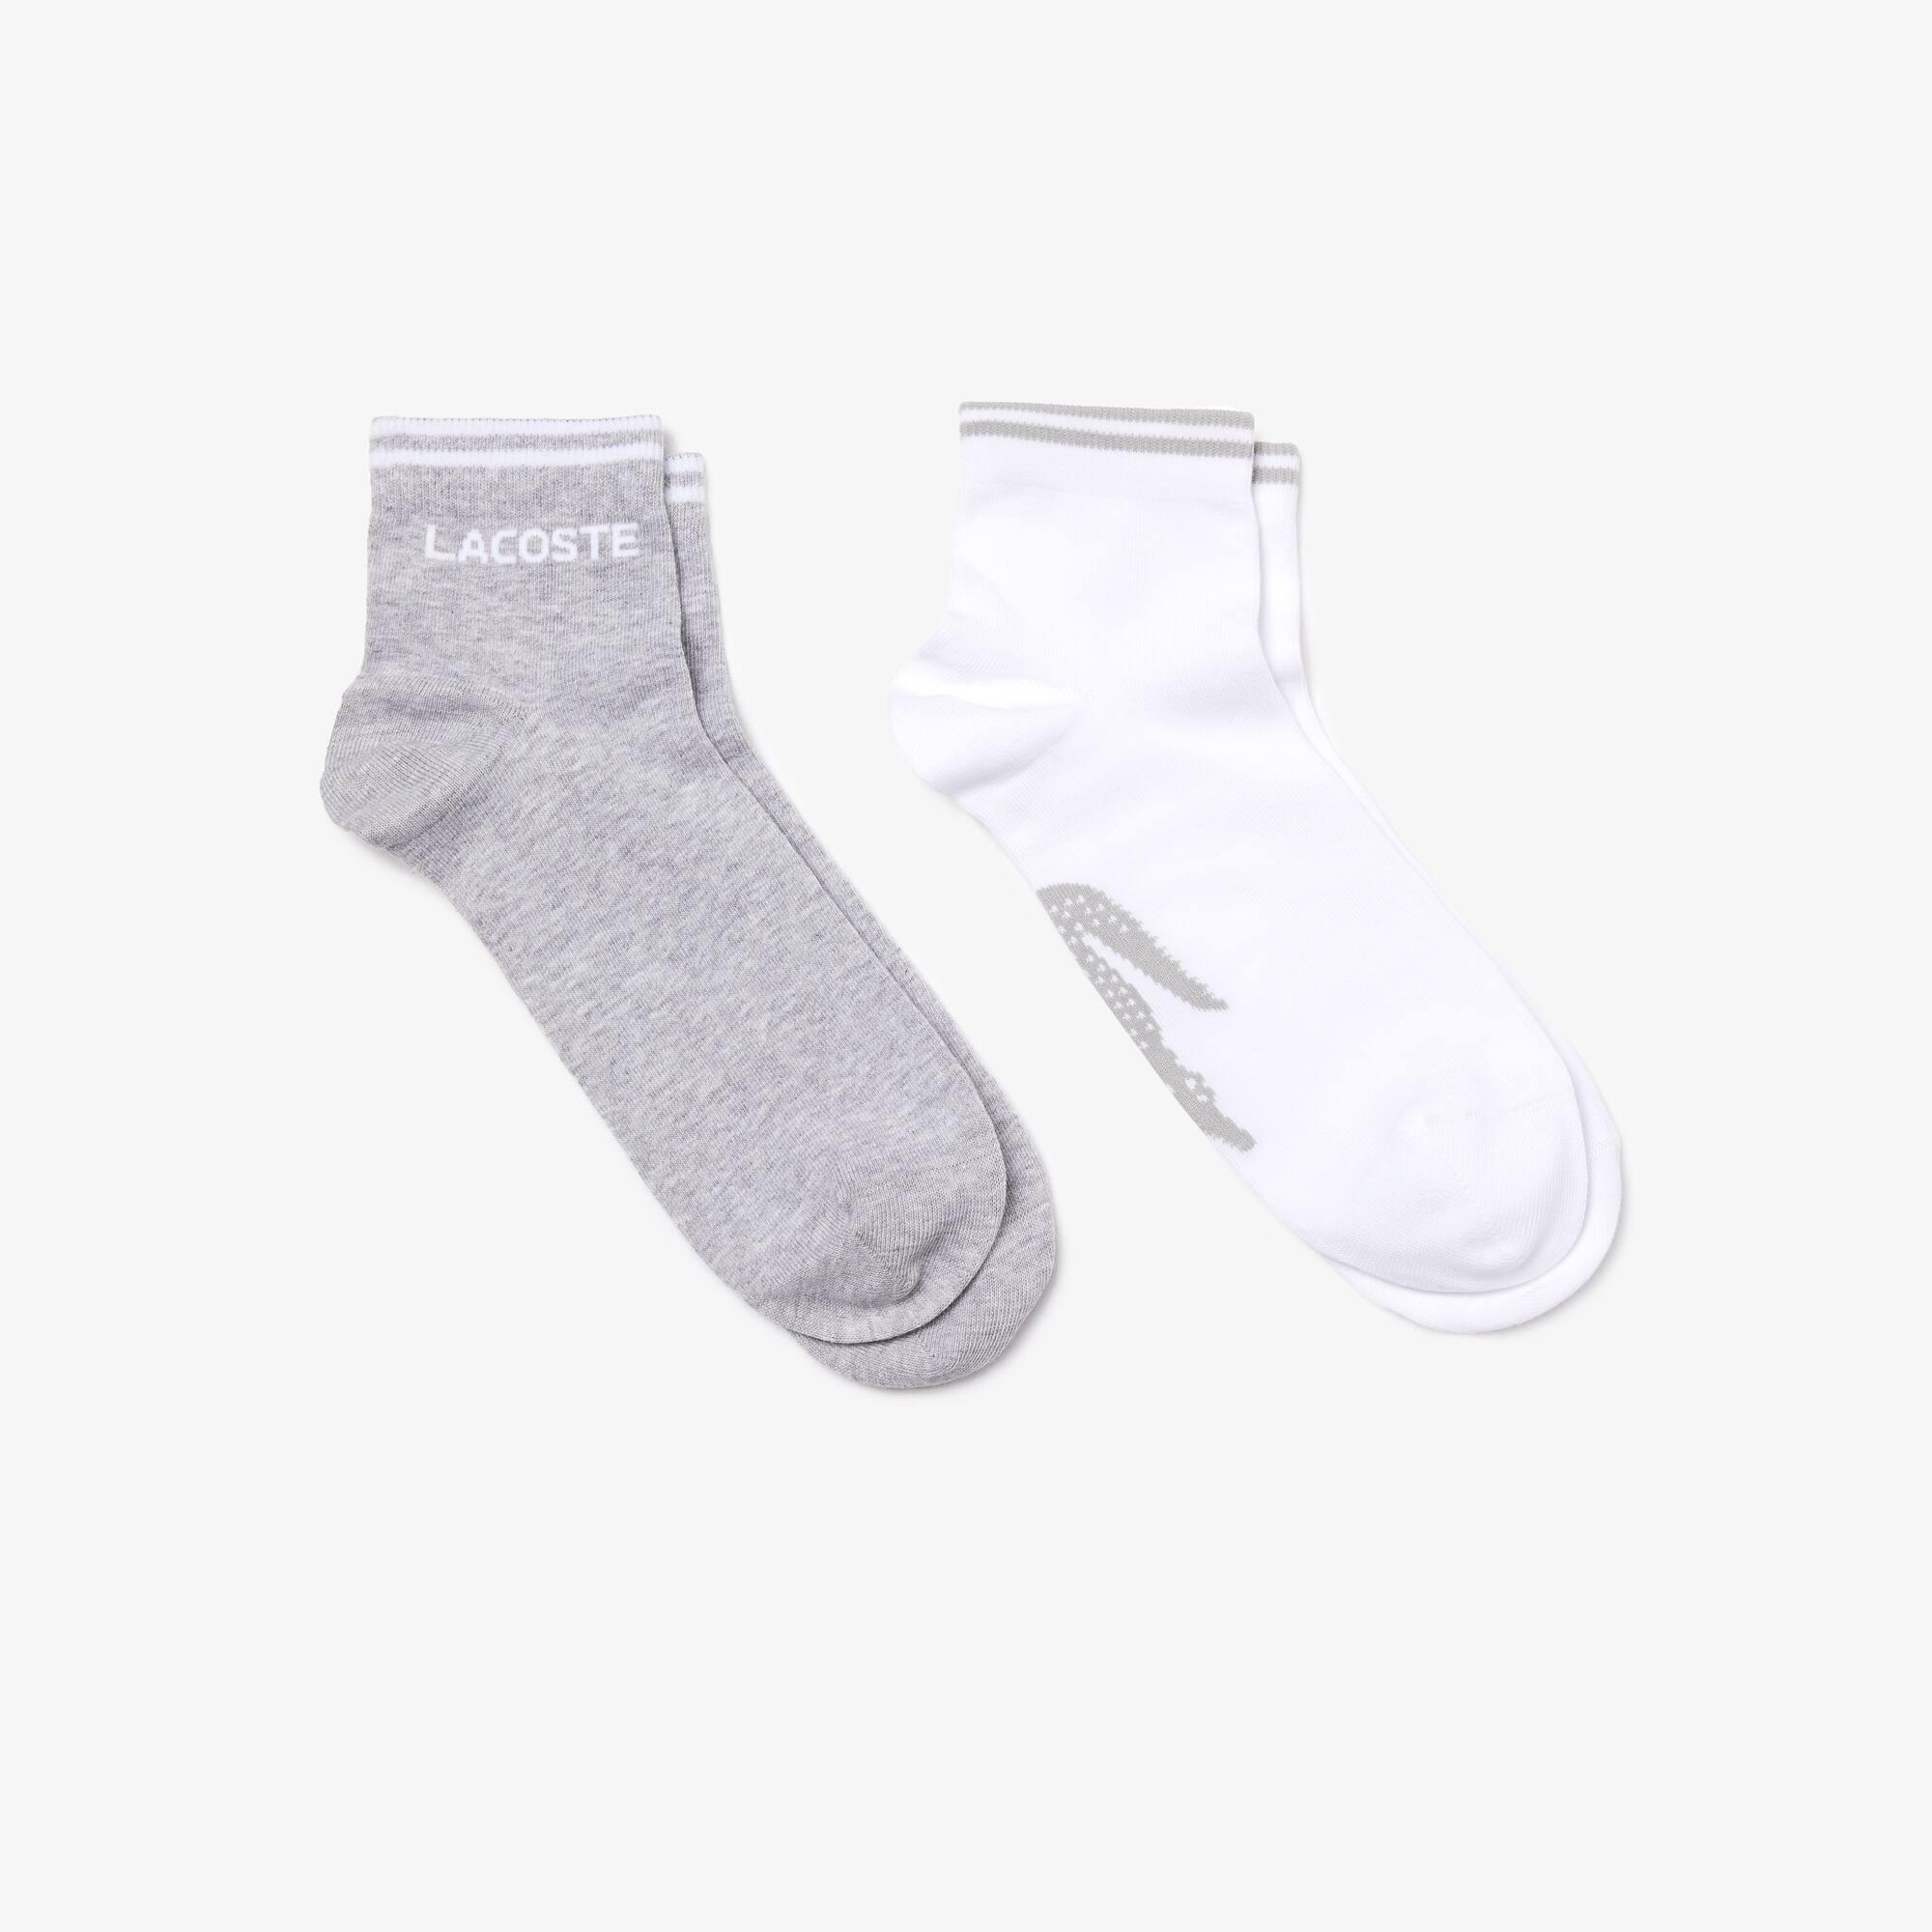 Confezione da due paia di calze Lacoste Tennis basse in jersey jacquard